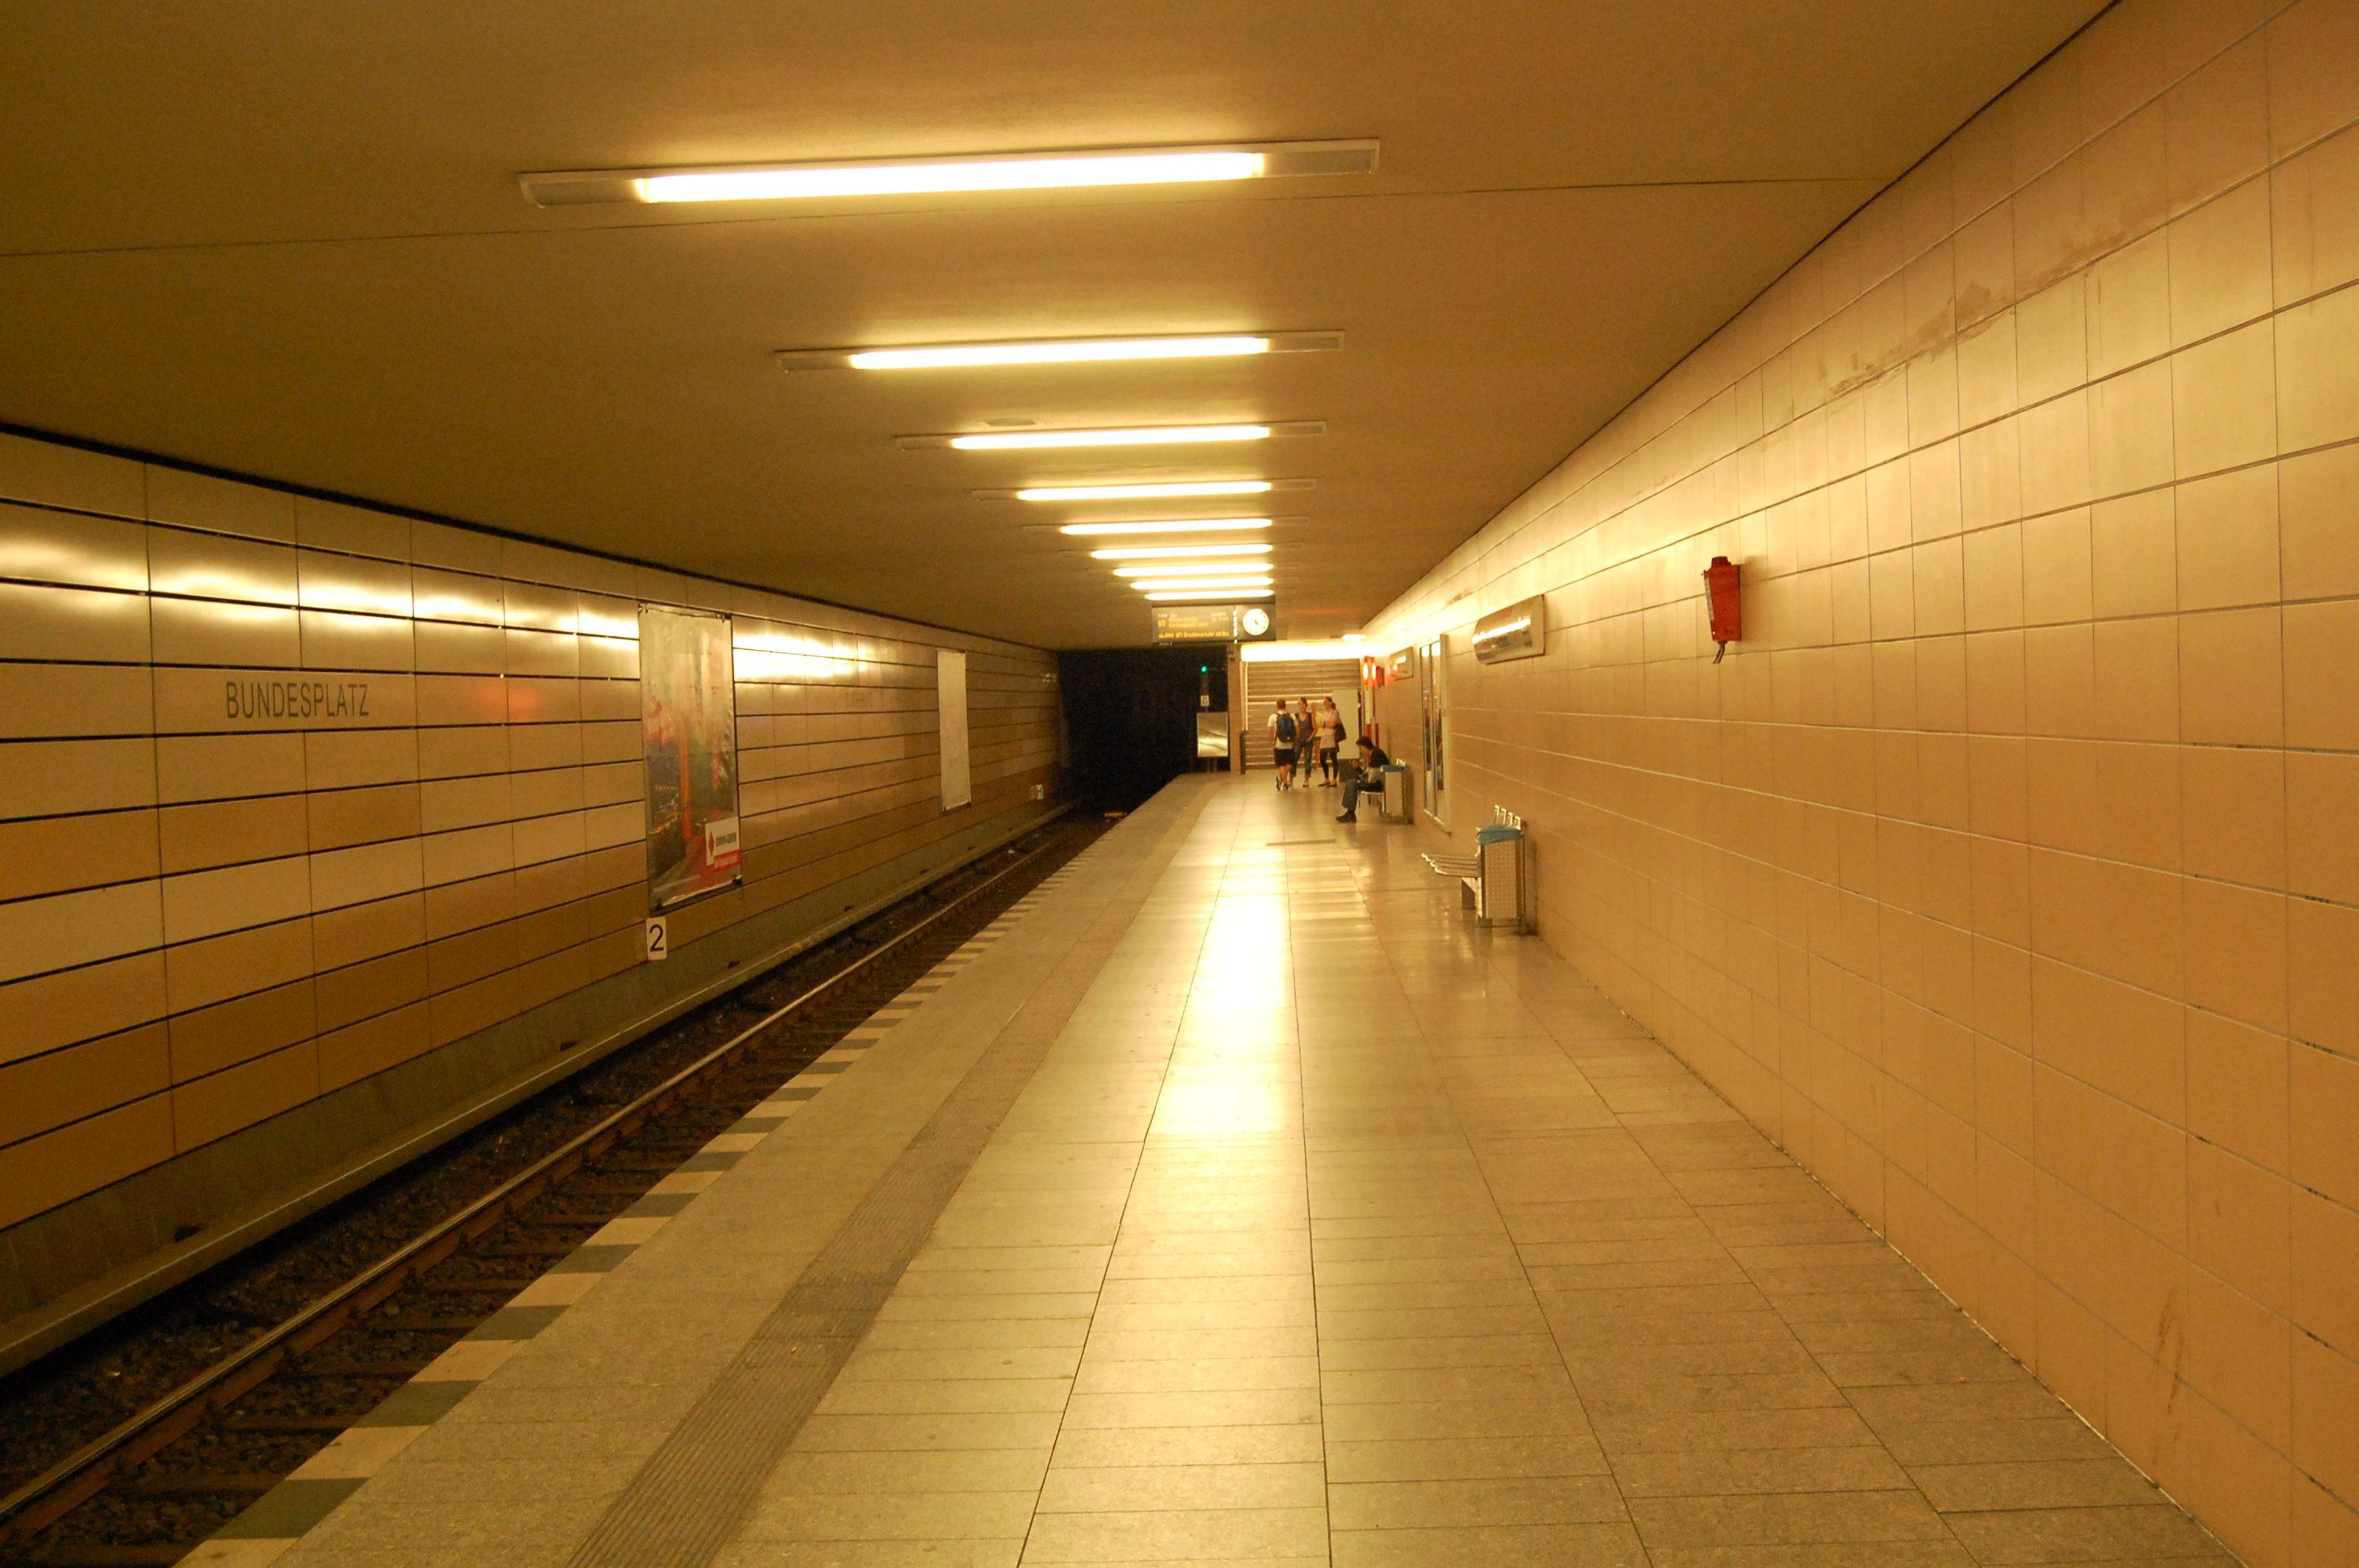 u-bf-bundesplatz-3_web